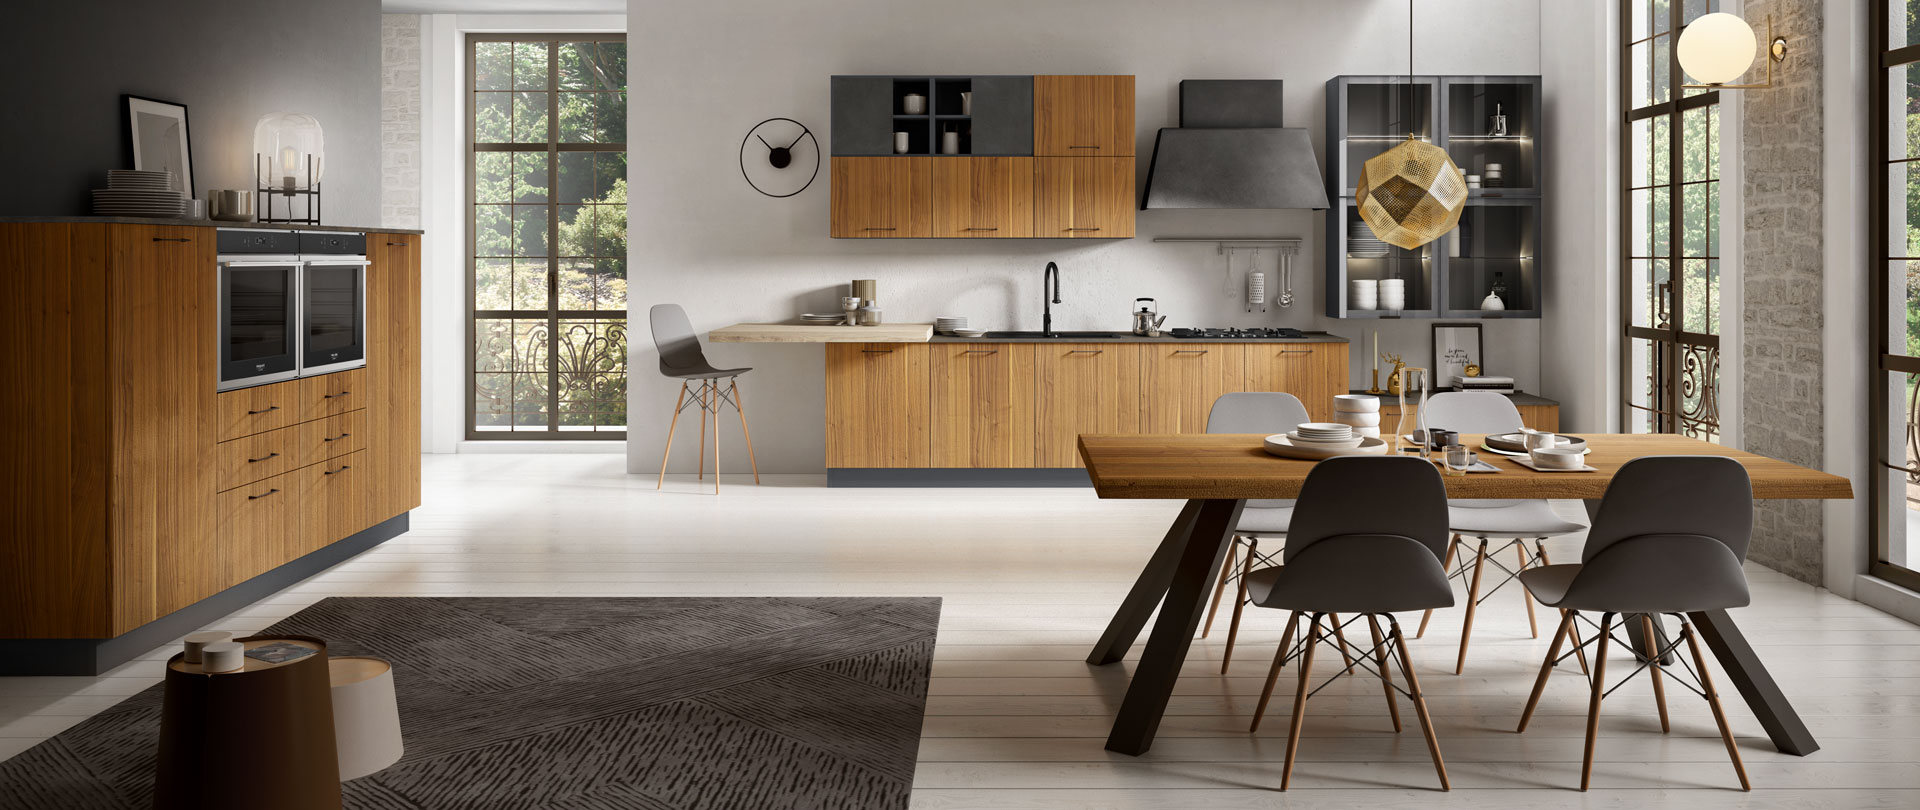 Matrix Cucine Moderne Mobili Franco Perri